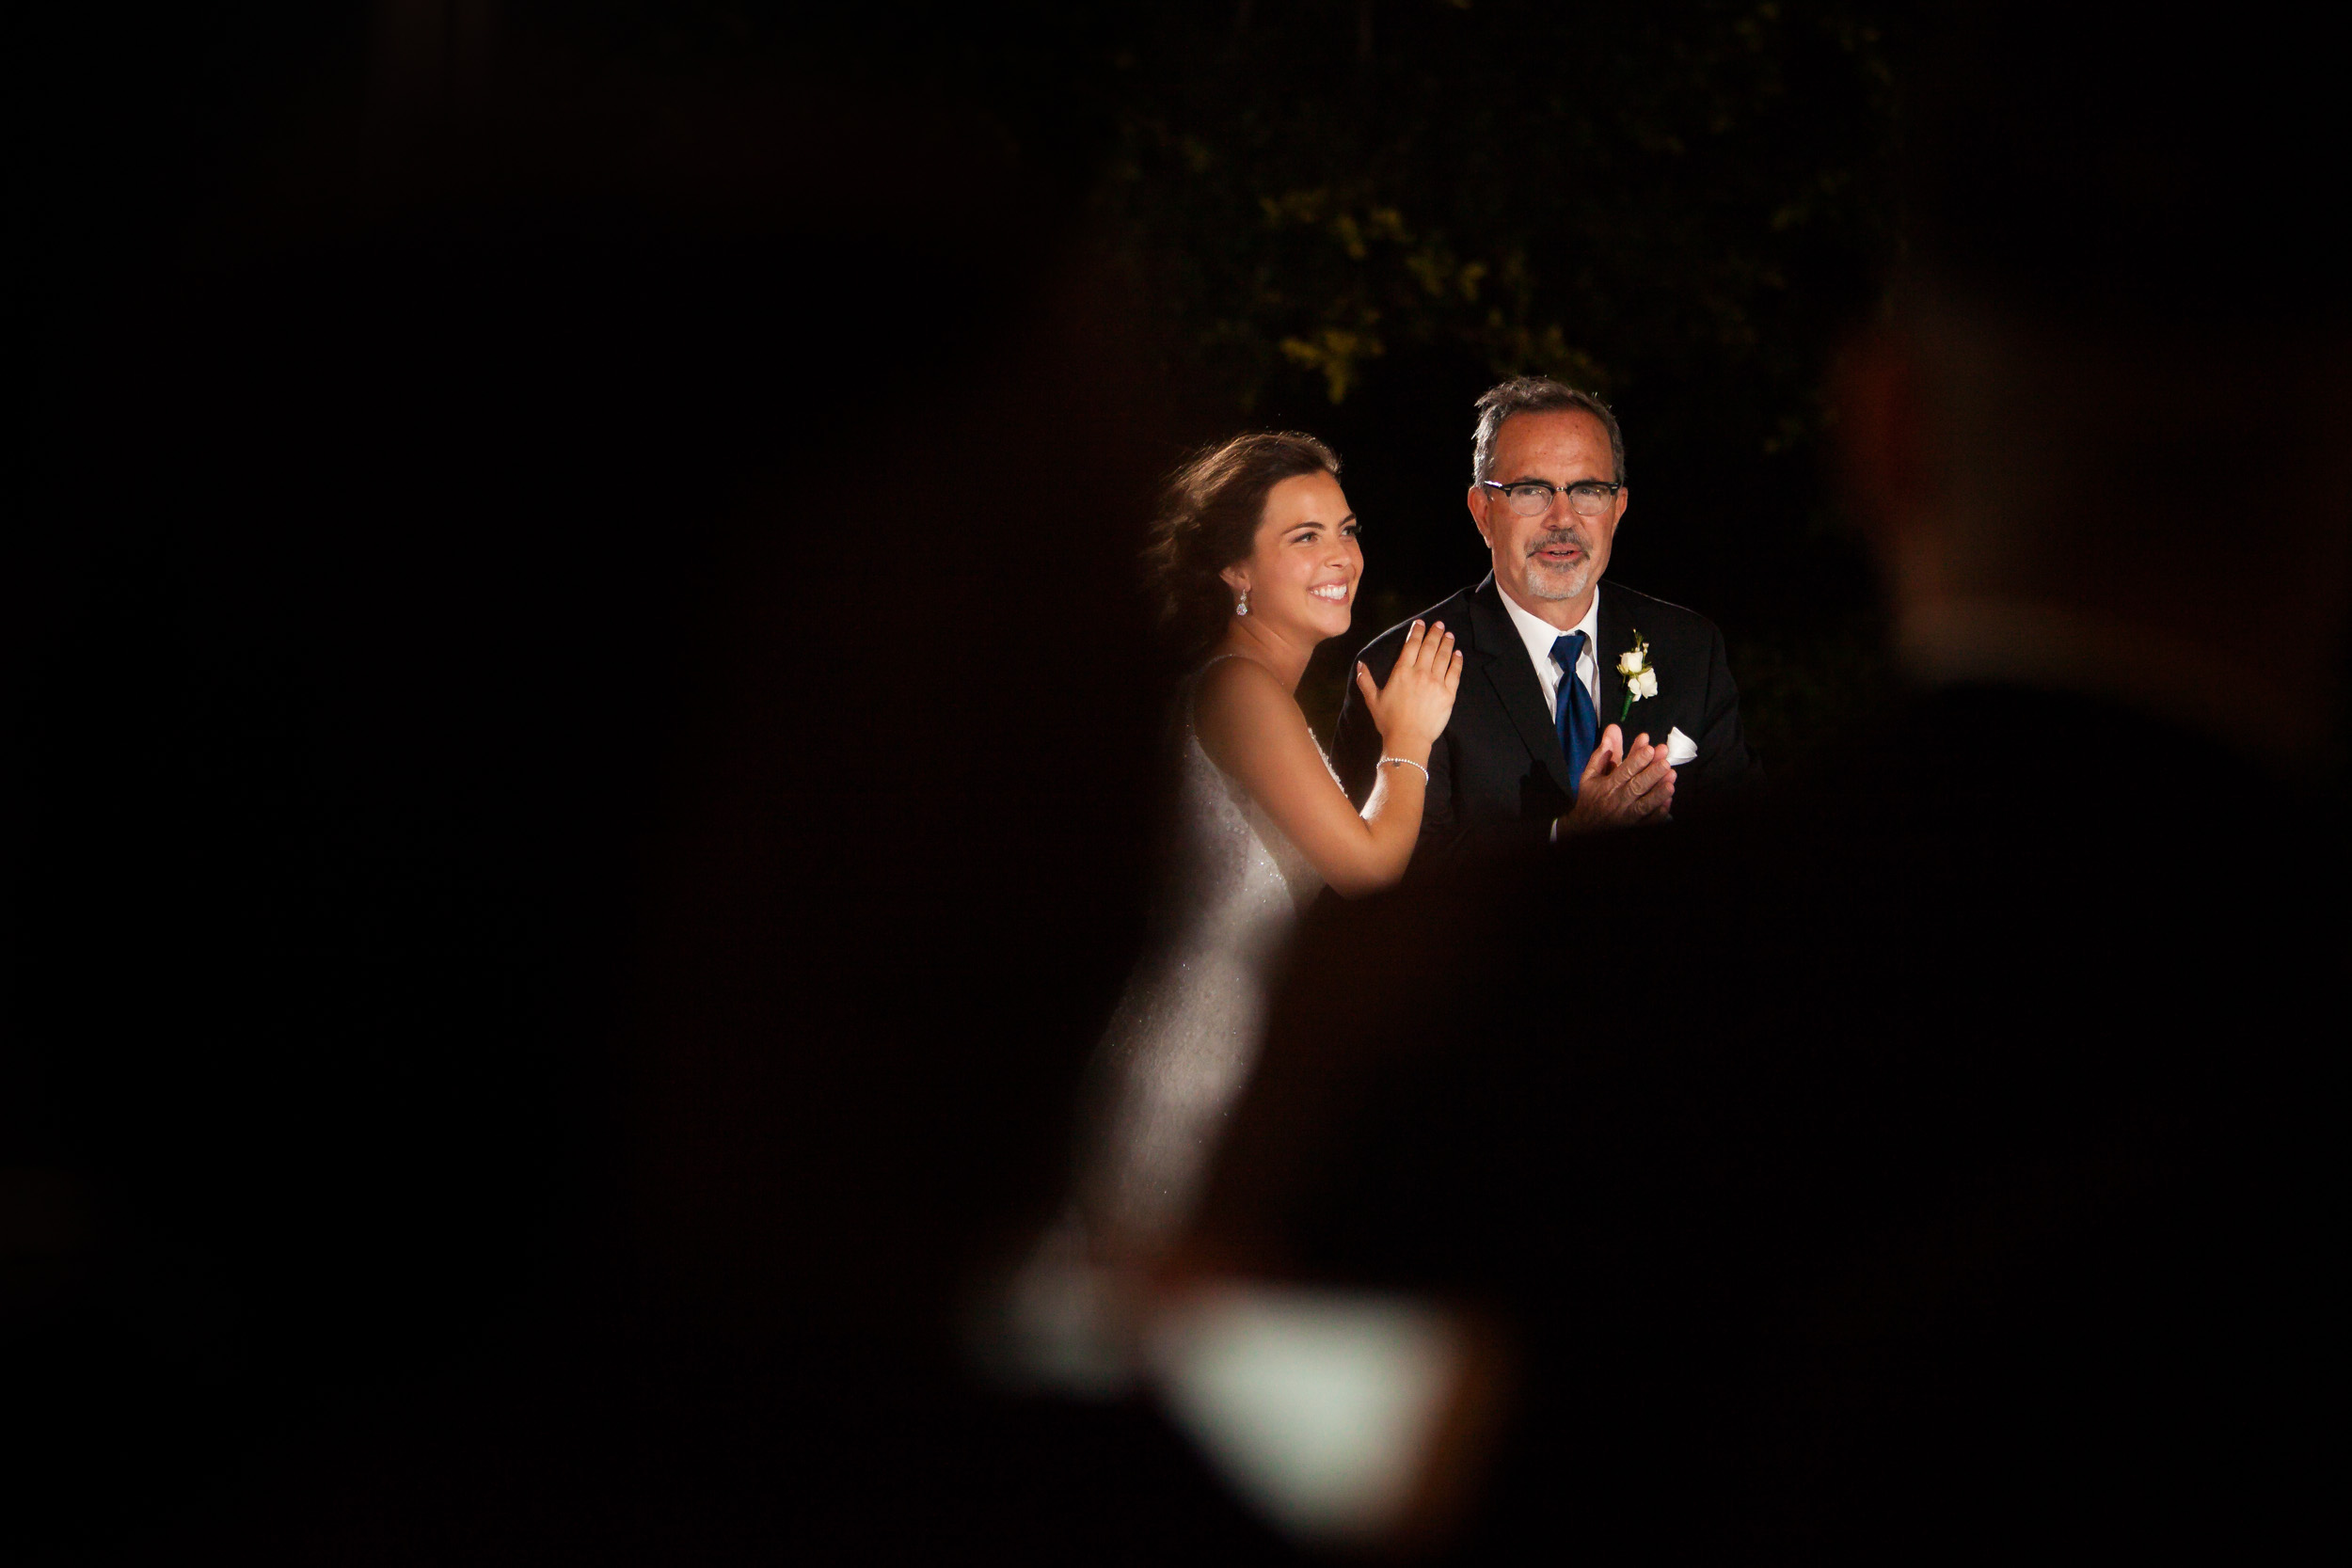 Flordia-Wedding-Photography-71.jpg